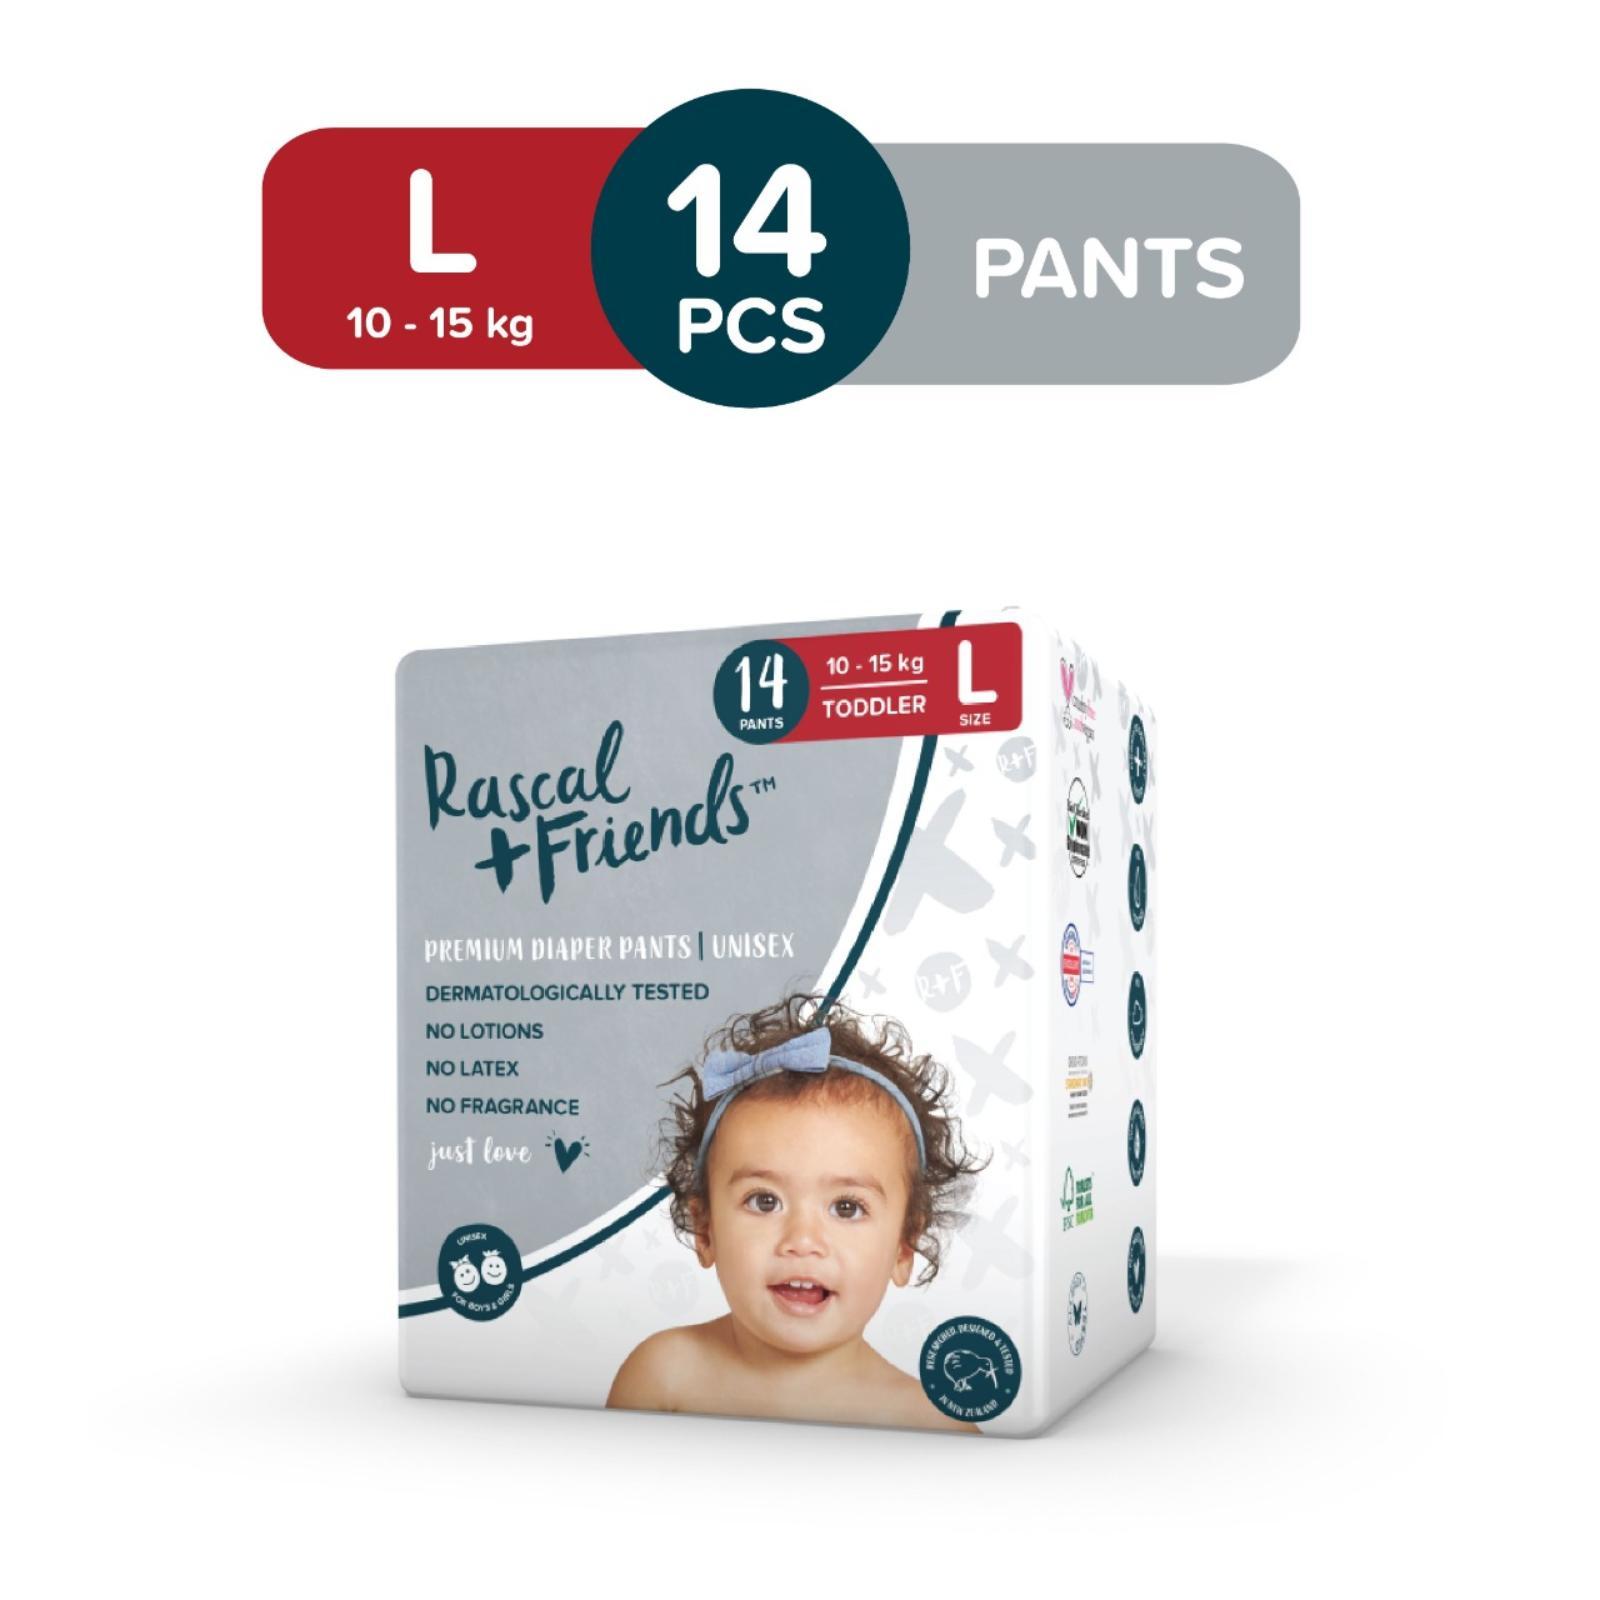 Rascal + Friends Pants L - Sample [Max 1 per customer]